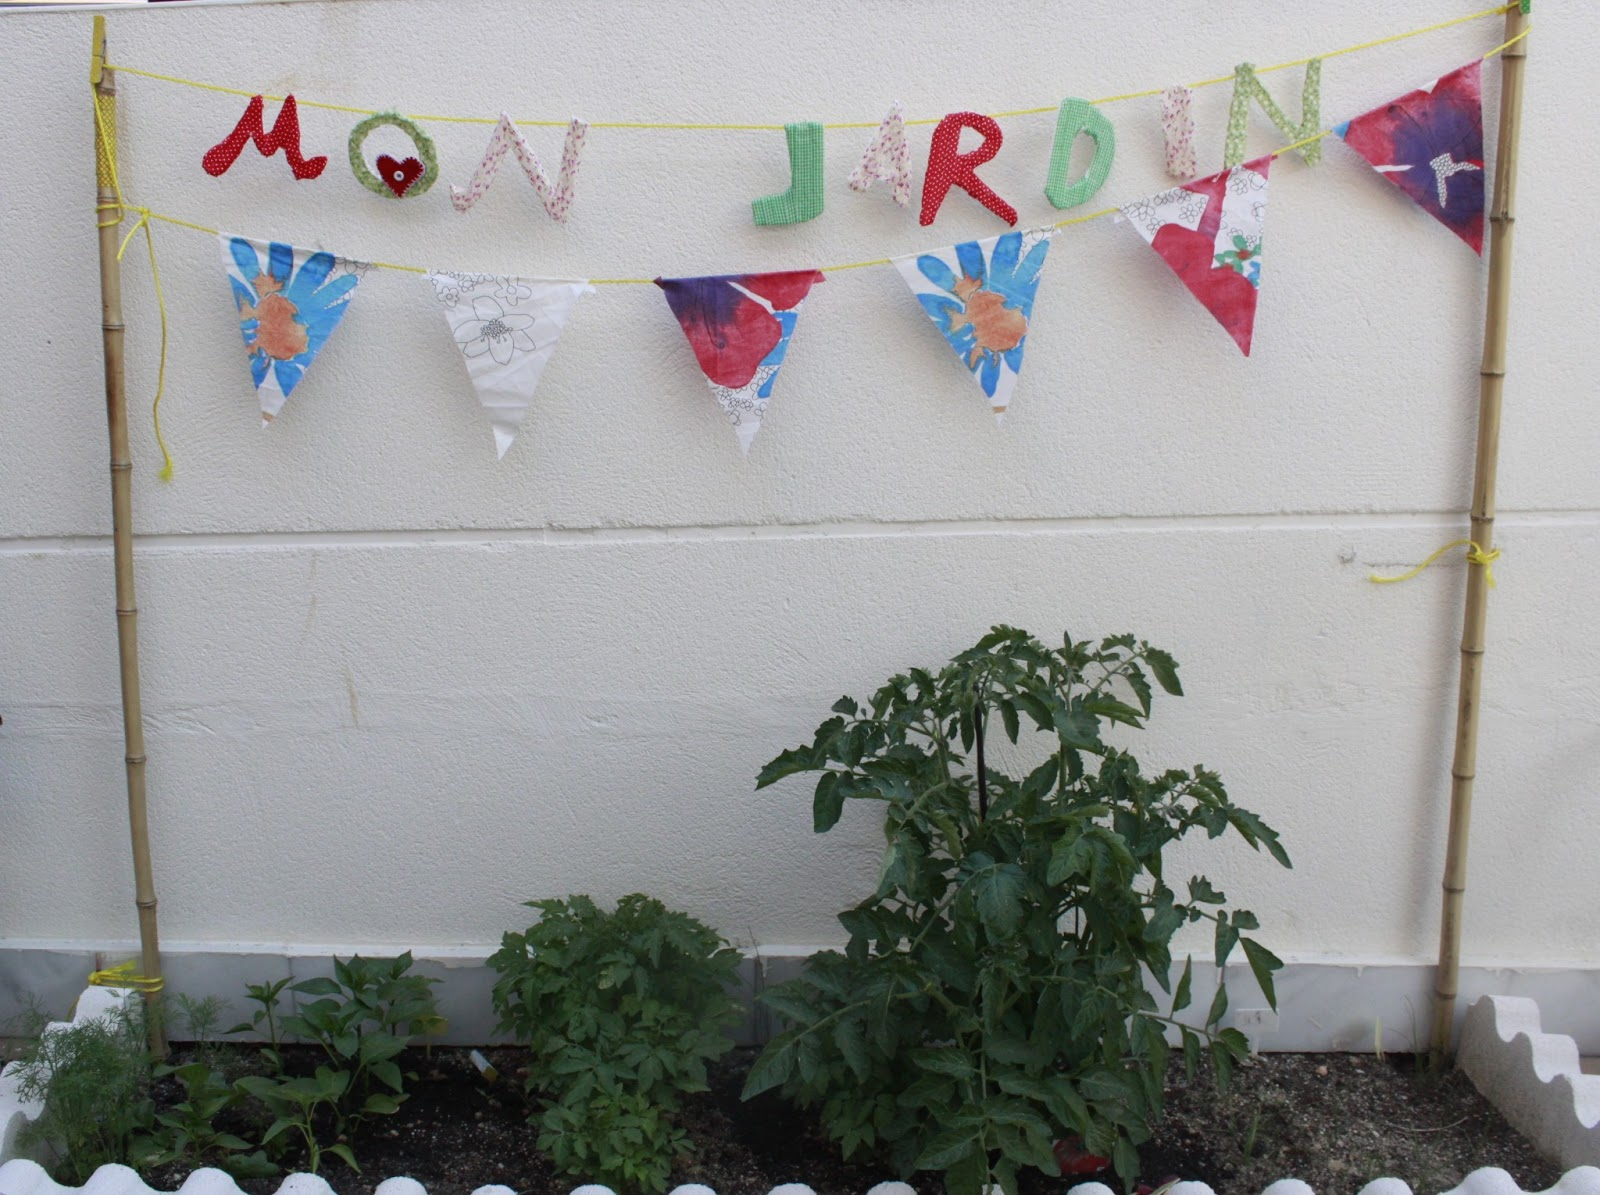 Manualidades en casa manualidades con ni os decoraci n for Decoracion para jardin de ninos